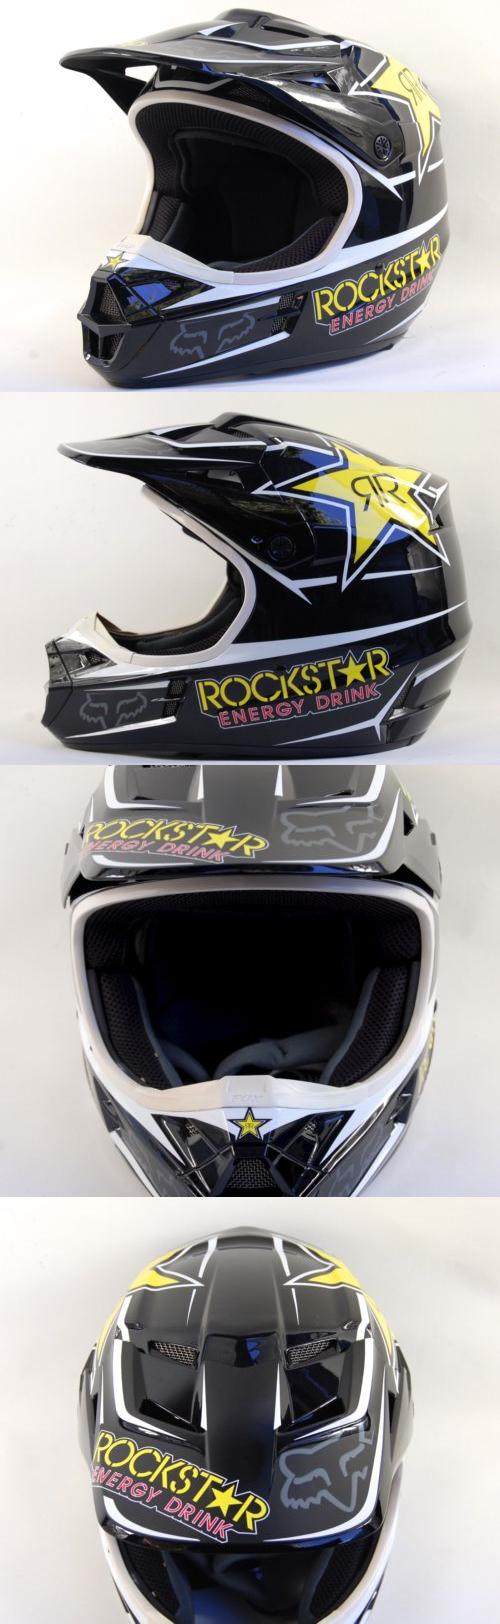 Helmet Accessories 177865: Fox Racing Dot Bmx Rockstars Mens Motocross Snell Helmet Size Medium 7 1 8-7 1 4 -> BUY IT NOW ONLY: $149.99 on eBay!